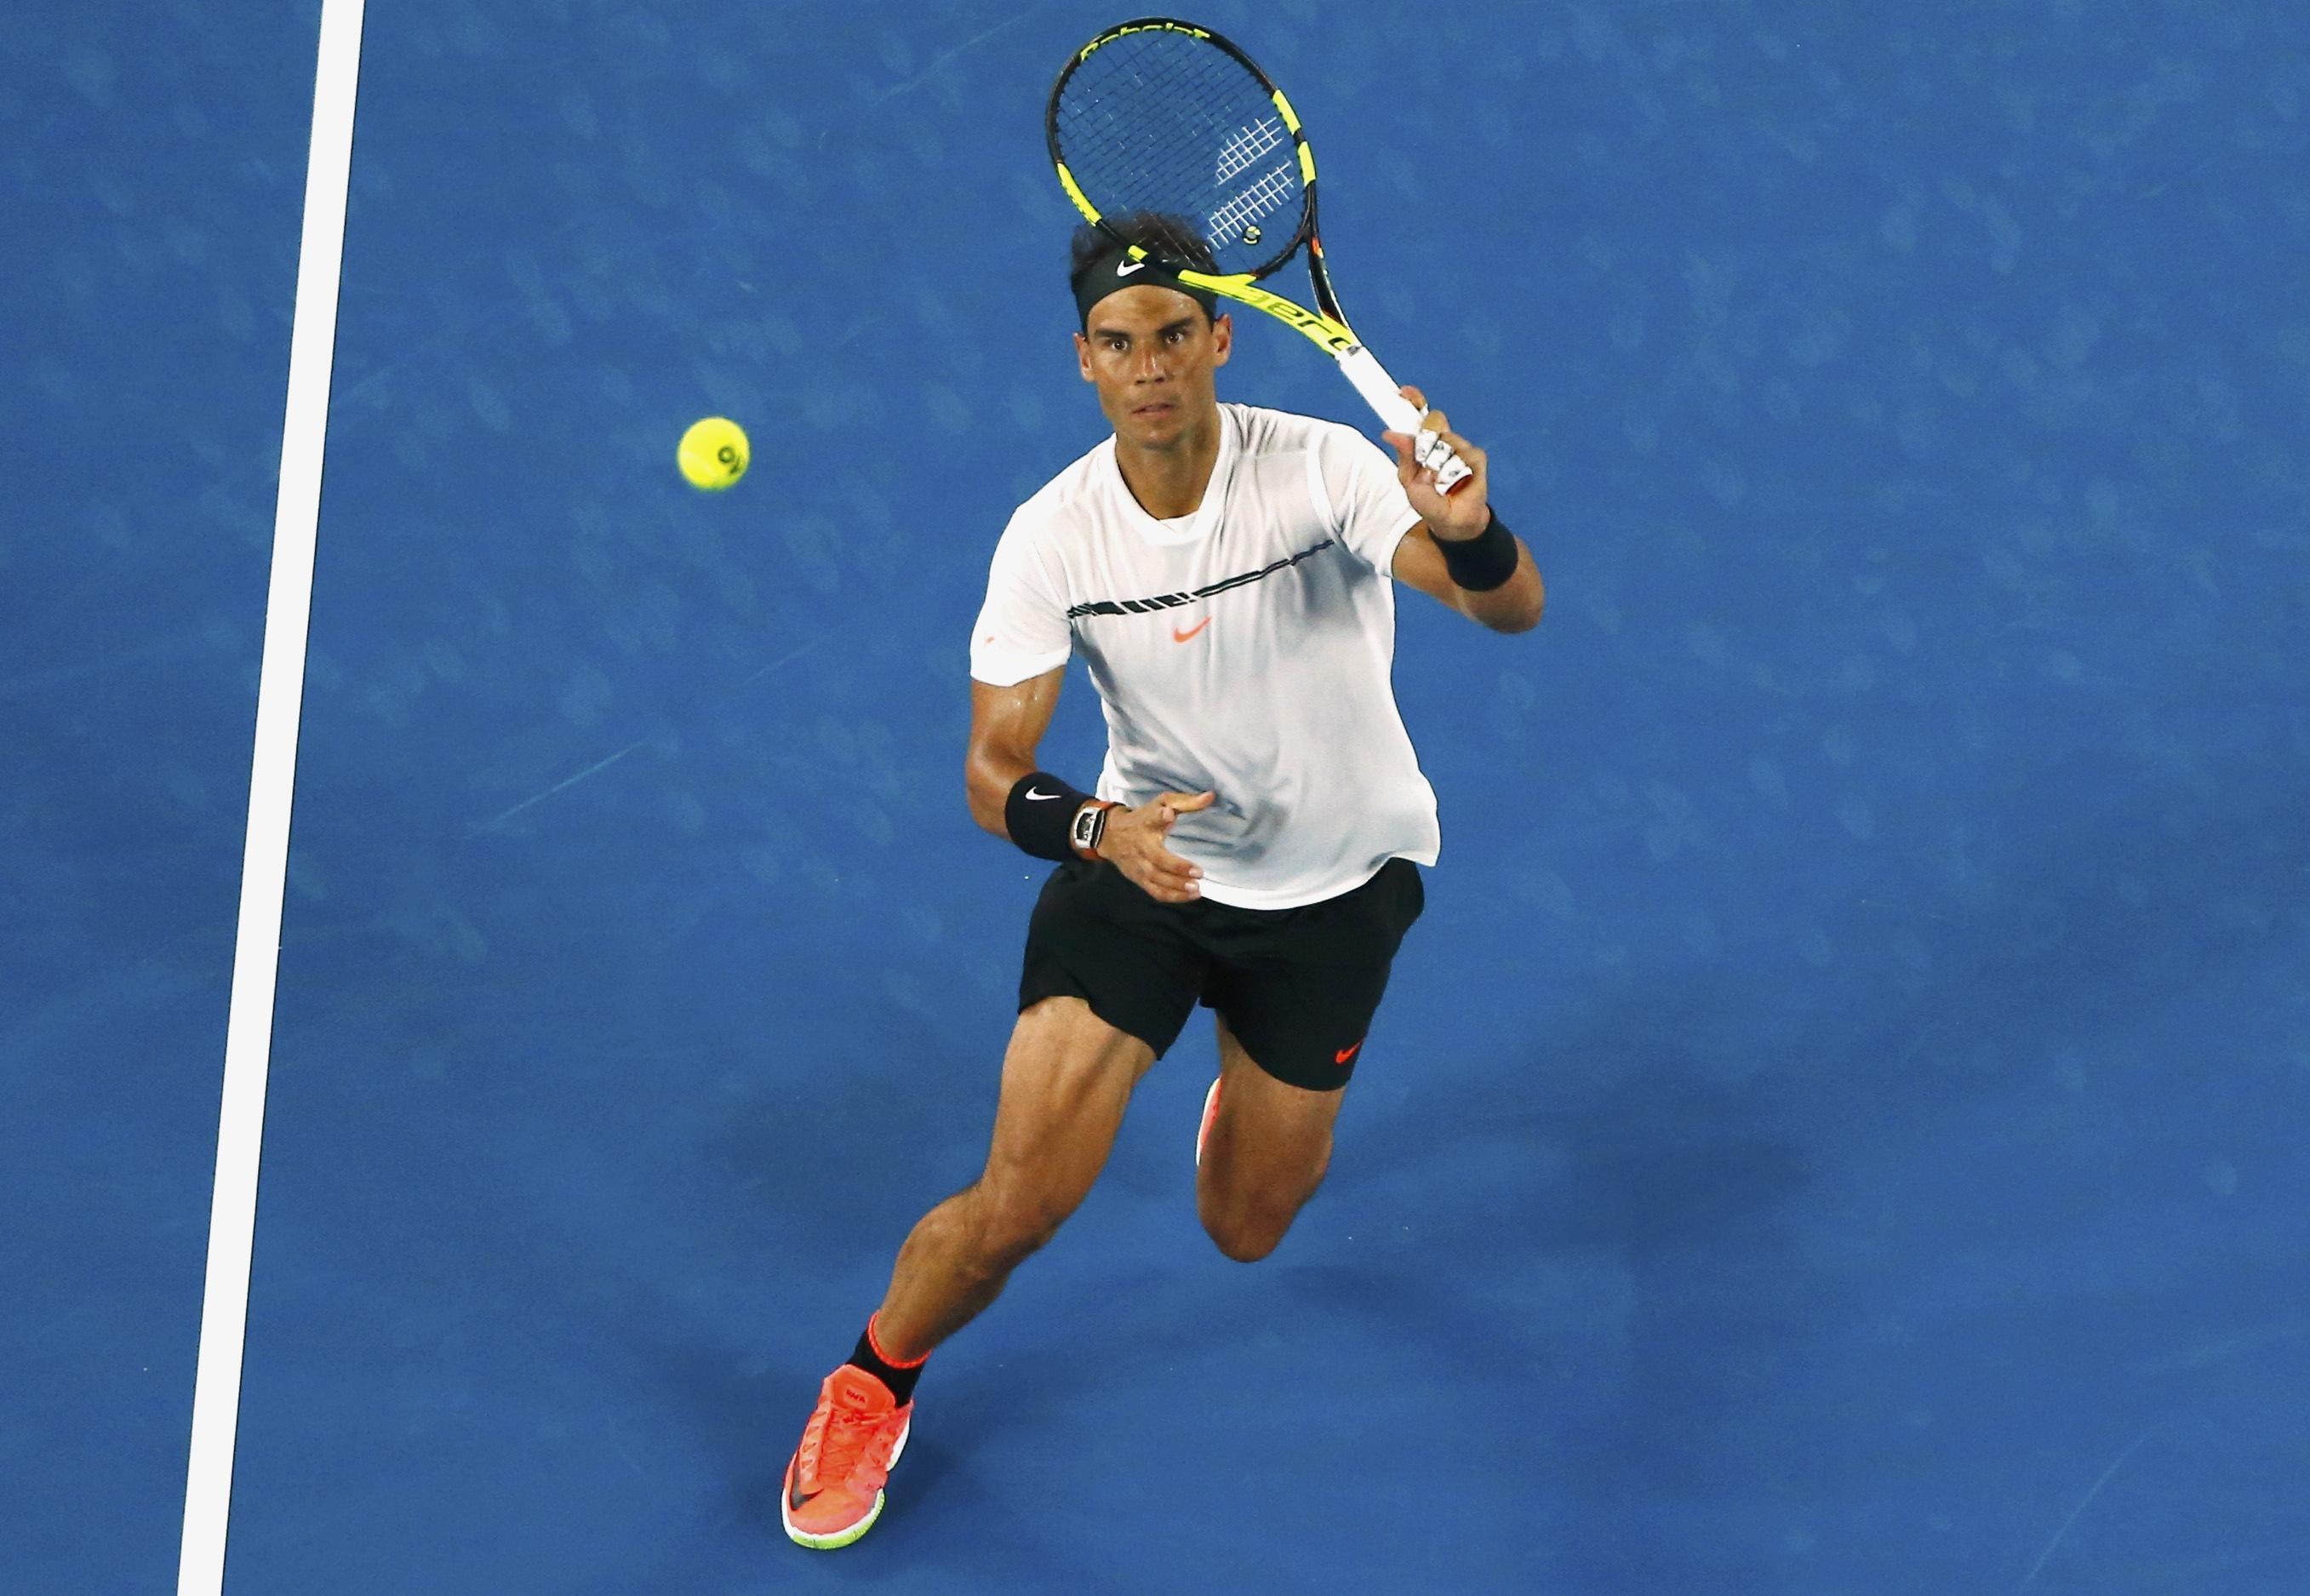 Rafael Nadal News: Nadal Thrilled By Return To Grand Slam Quarter-finals